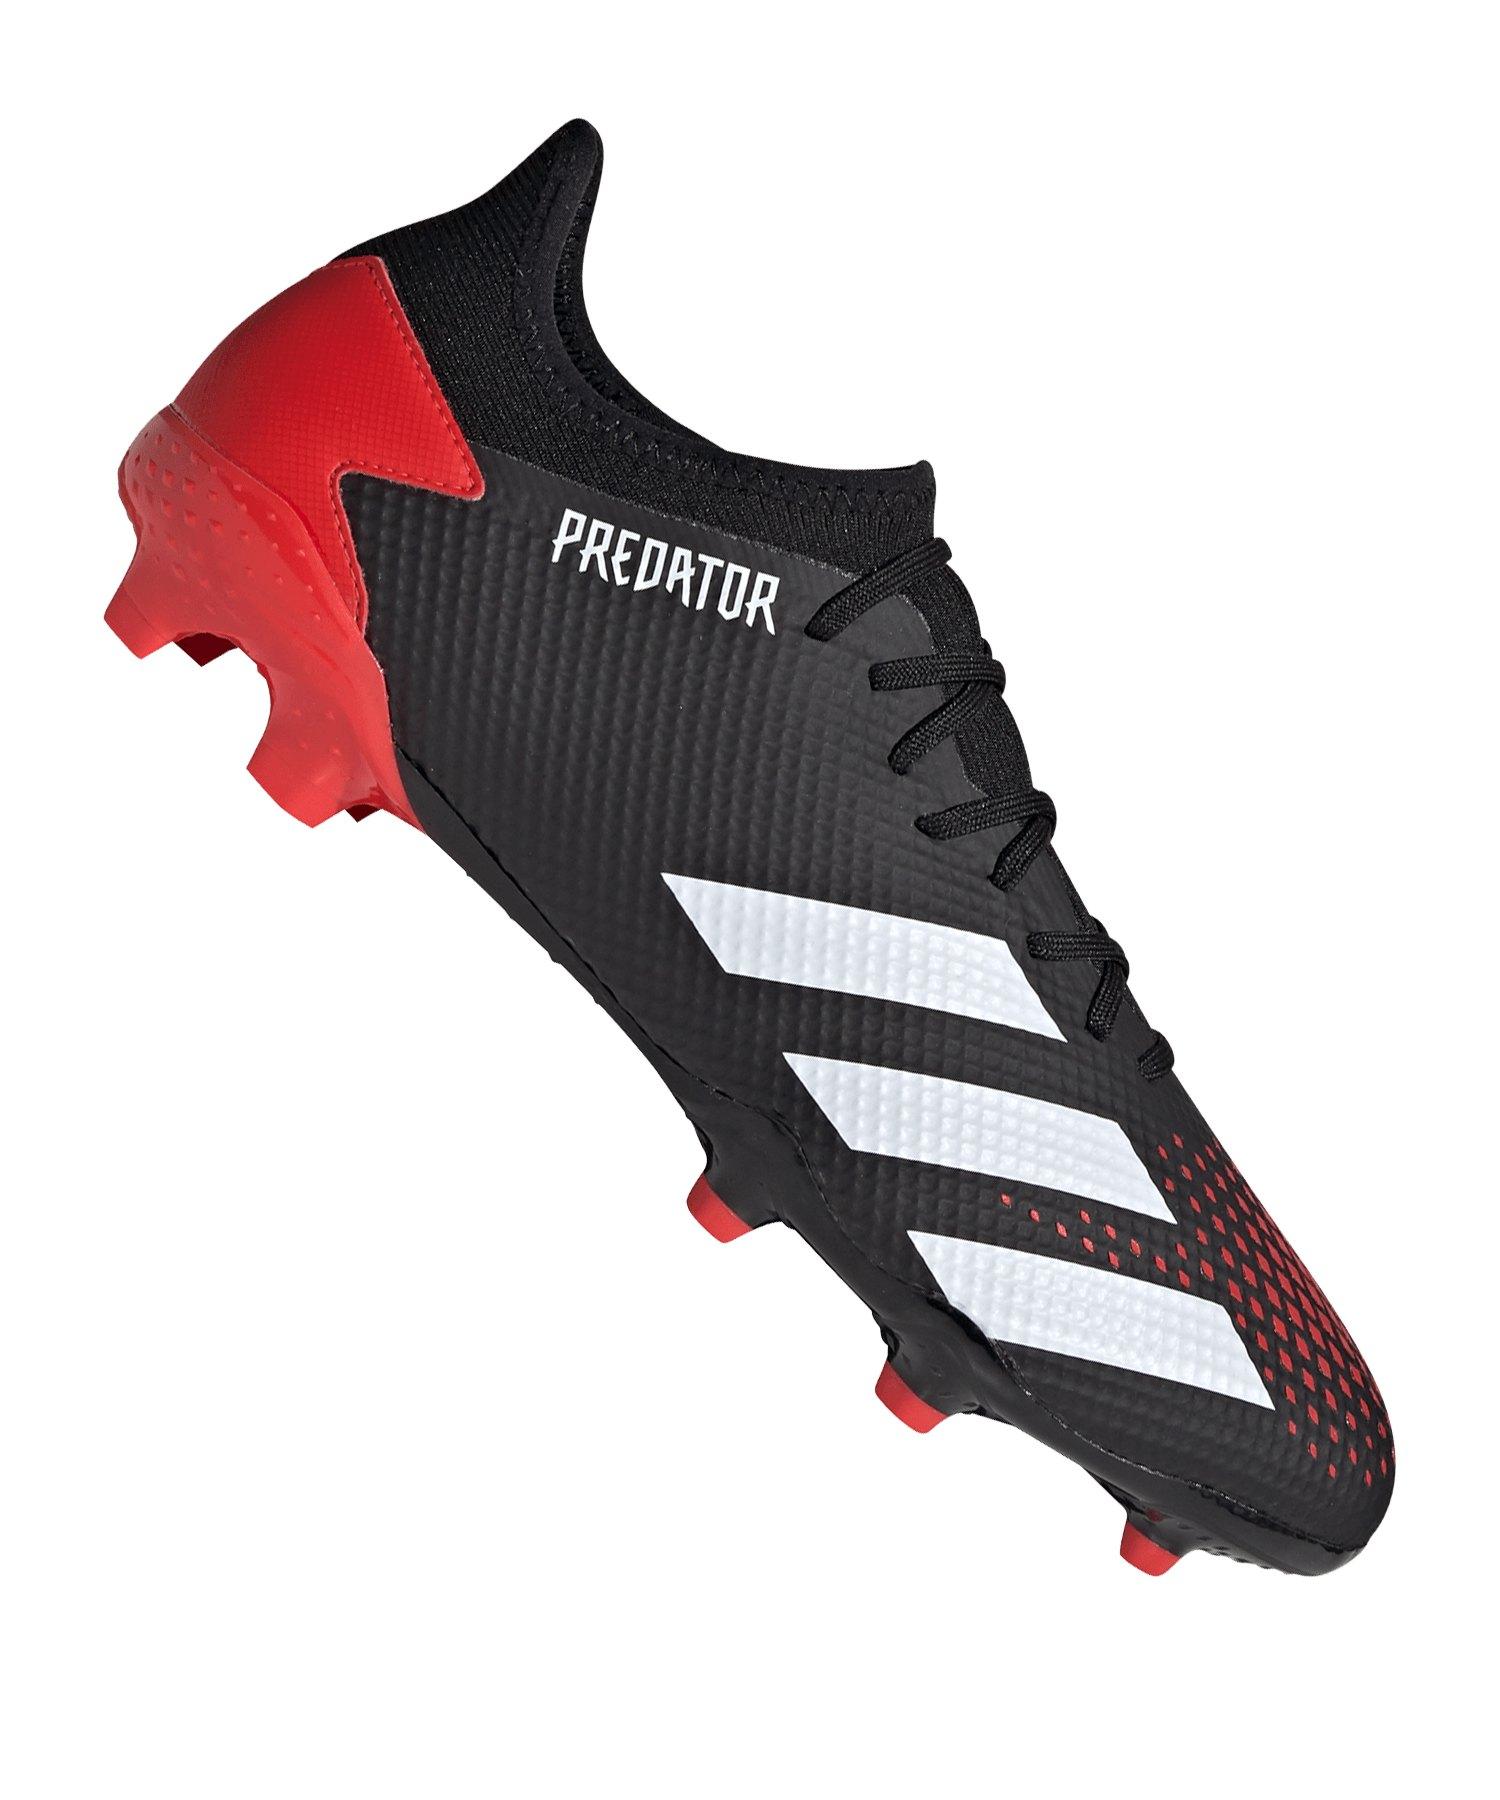 adidas Predator Mutator 20.3 L FG Schwarz Rot - schwarz